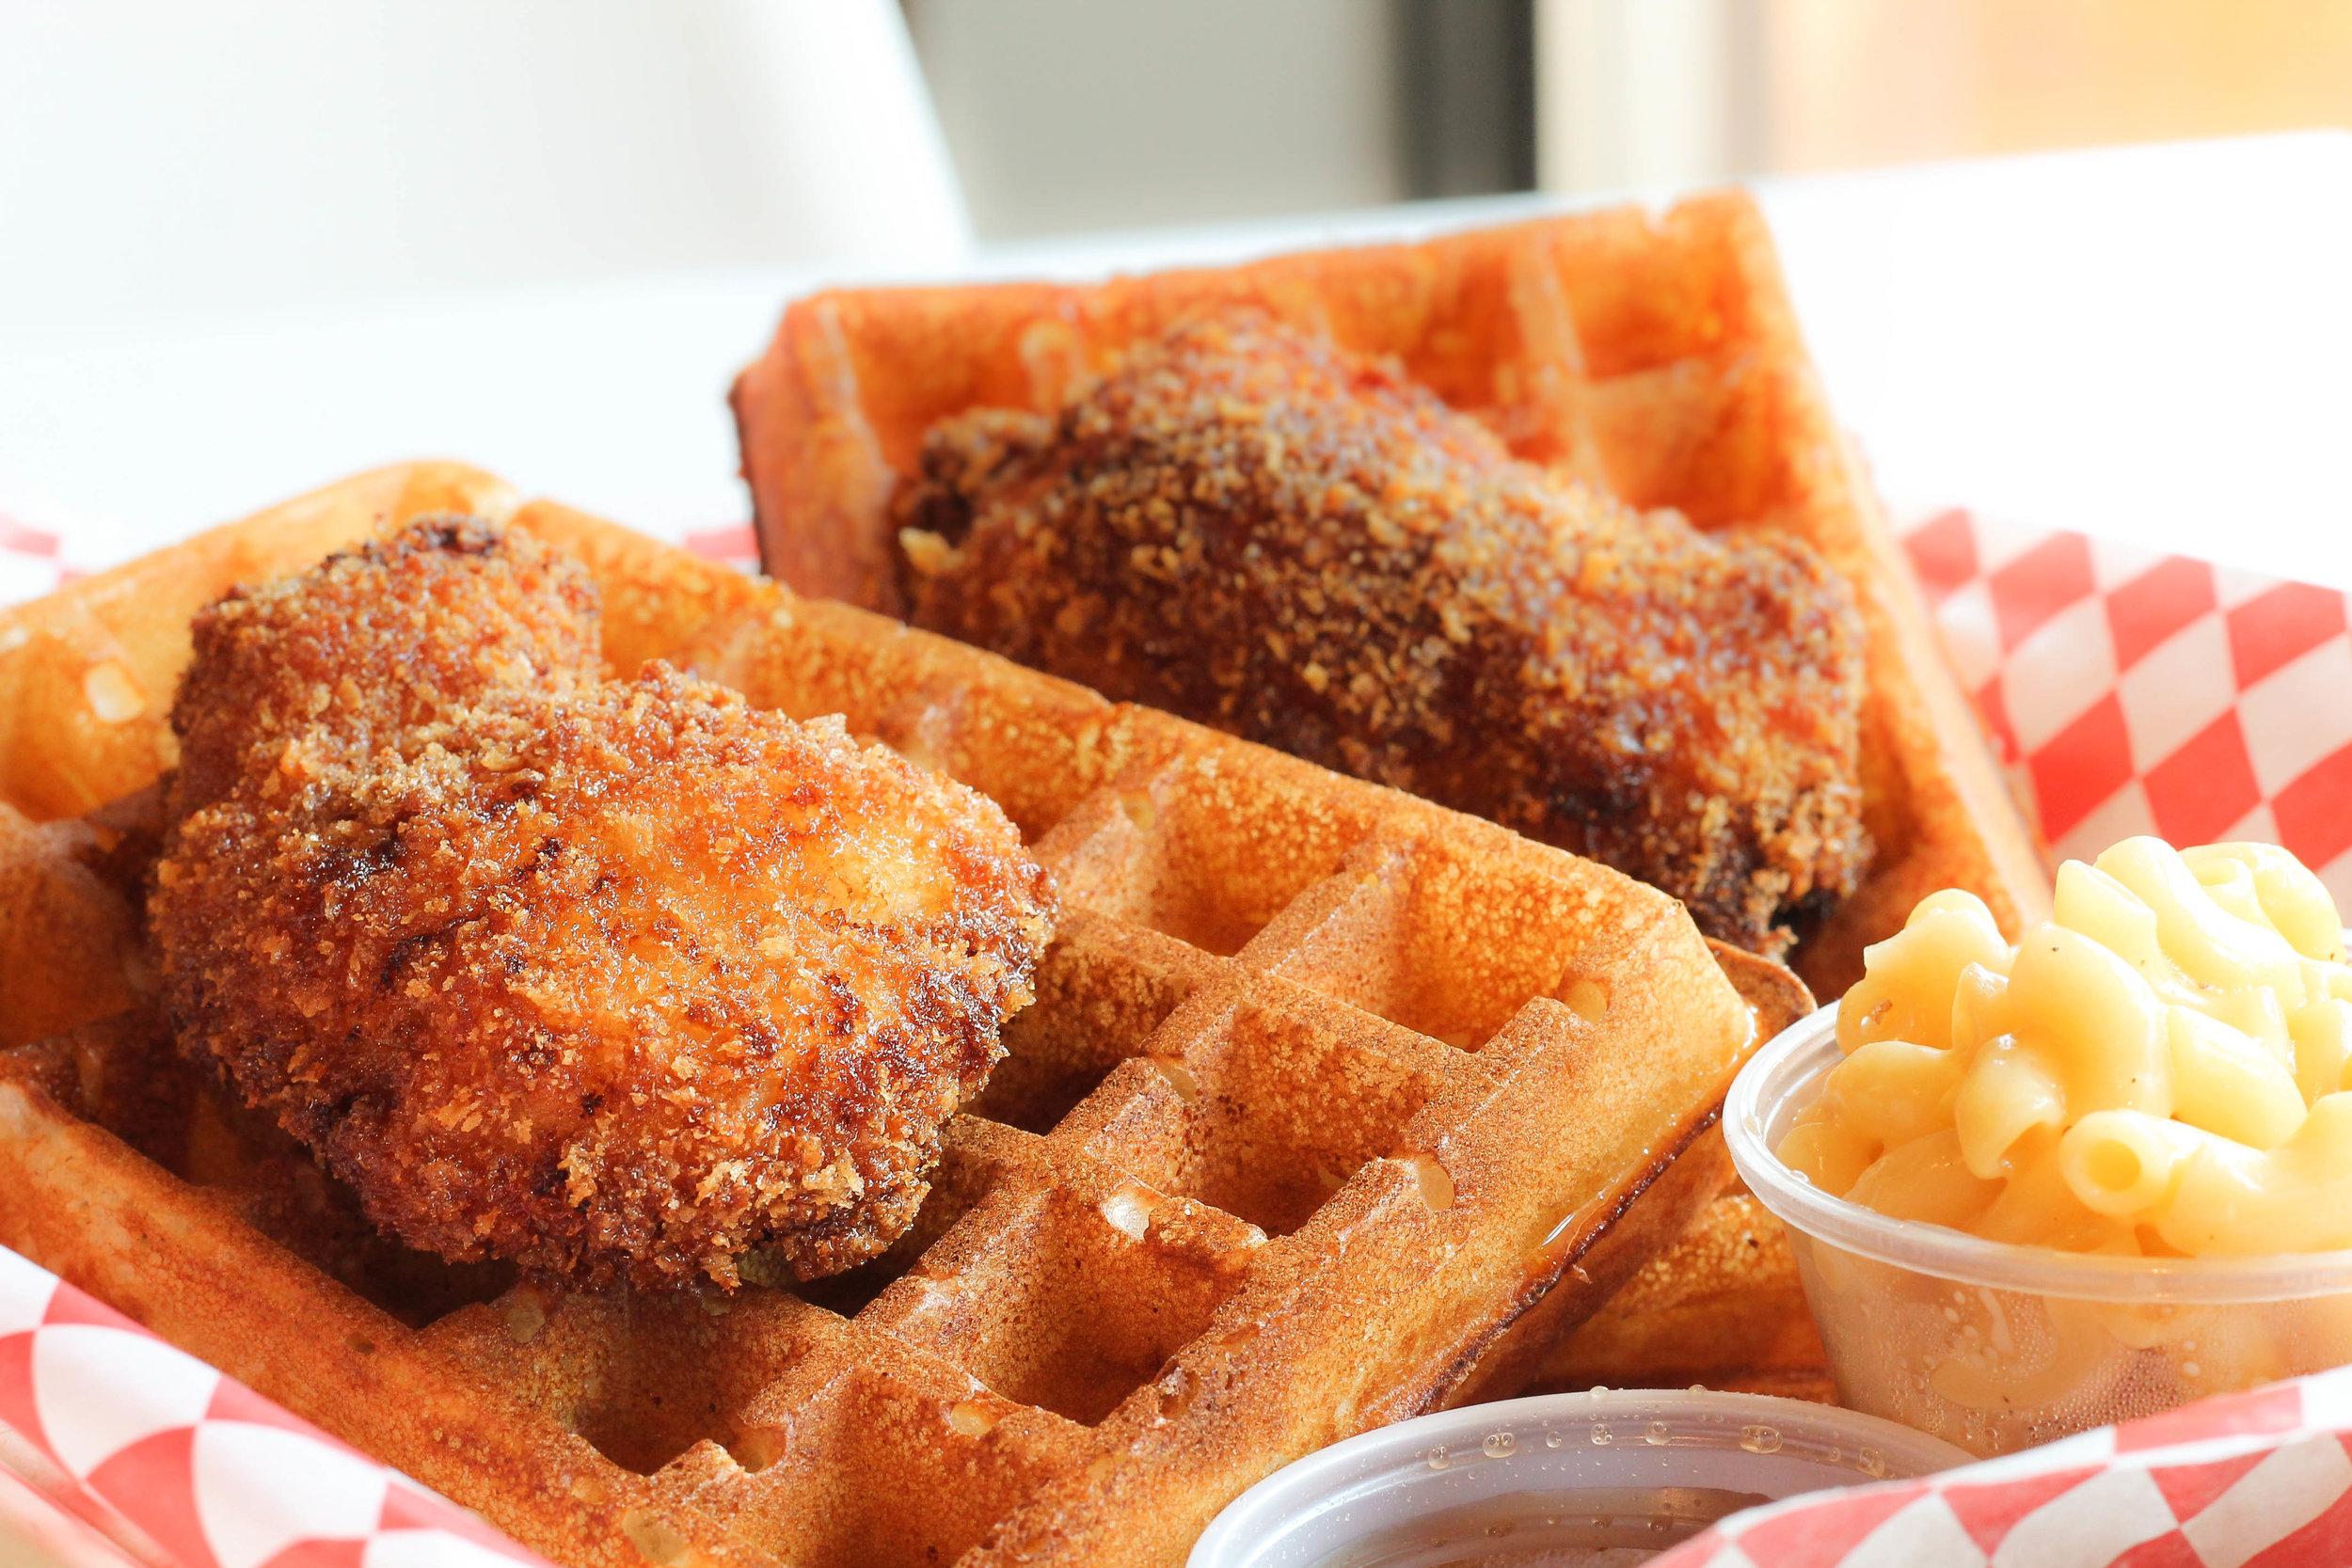 Chicken & Waffles from Sammy's Hot Mess